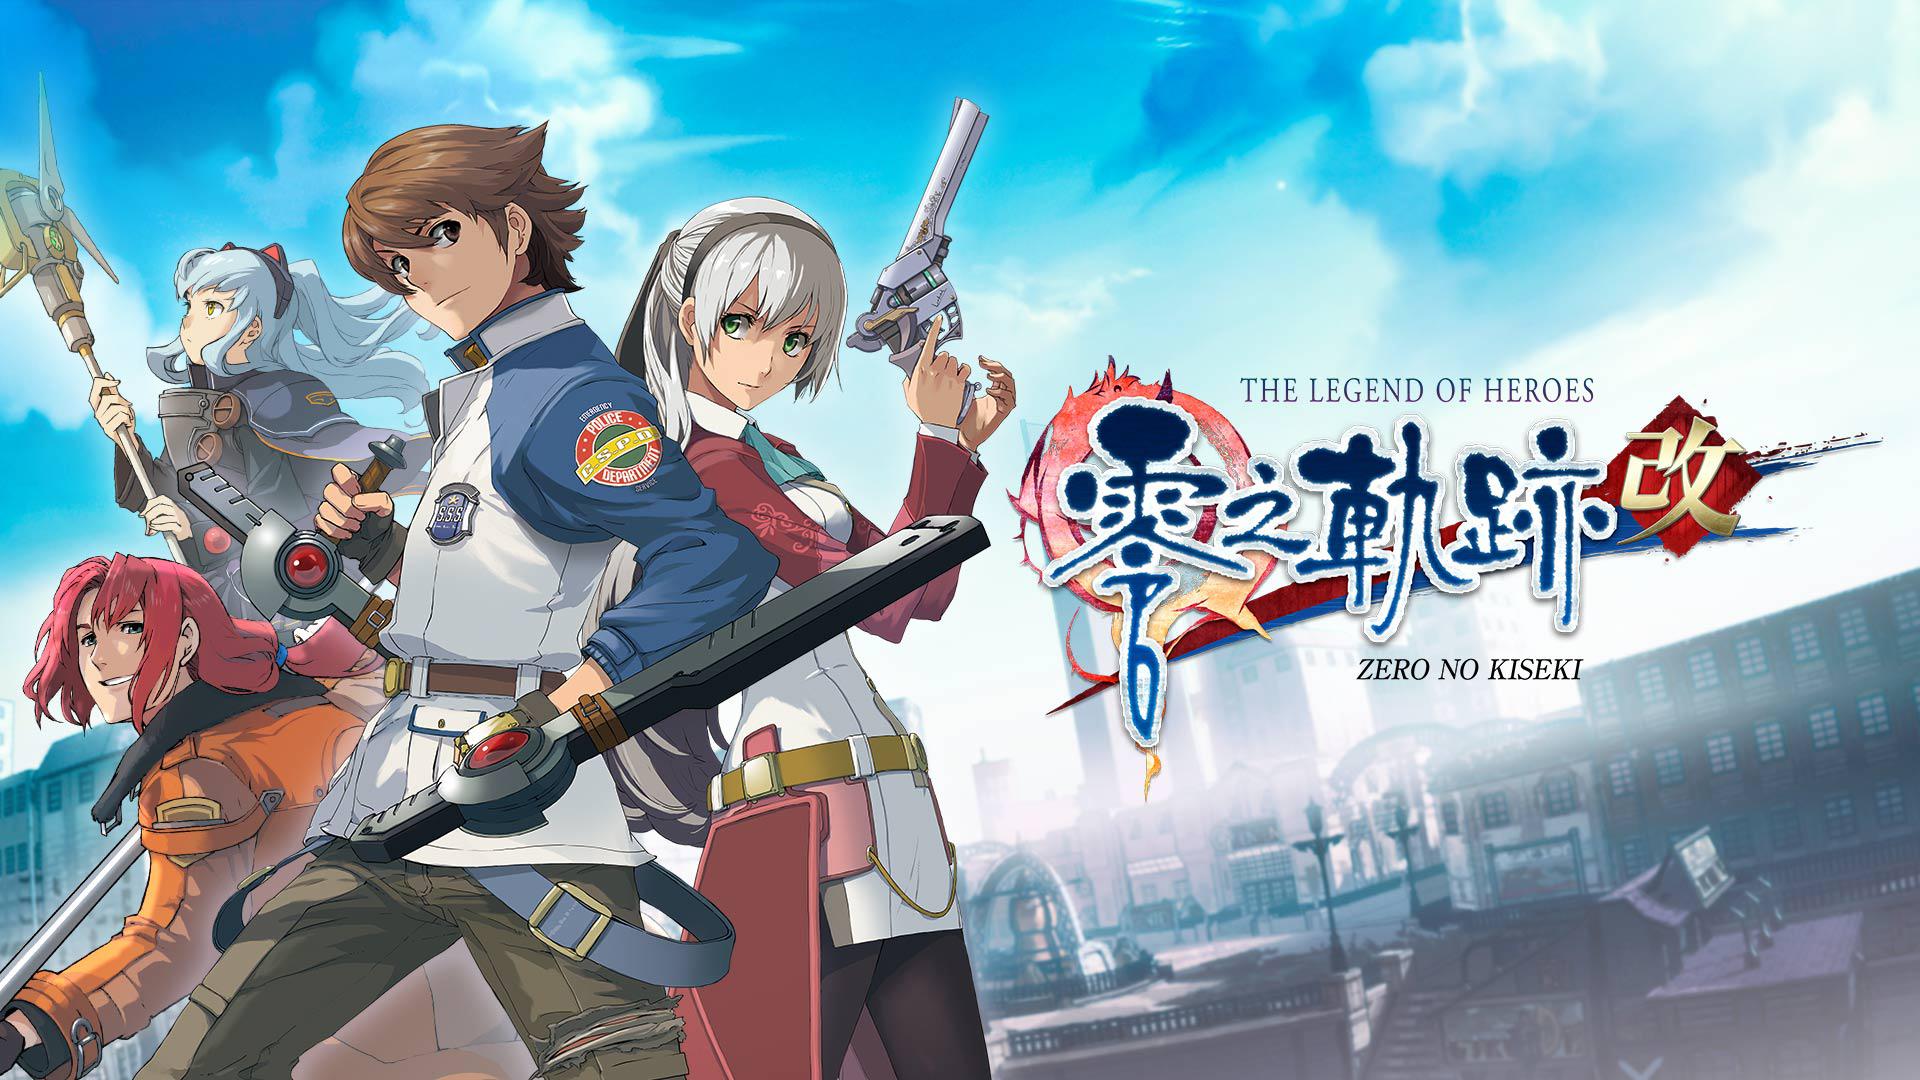 The Legend of Heroes: Zero no Kiseki Kai